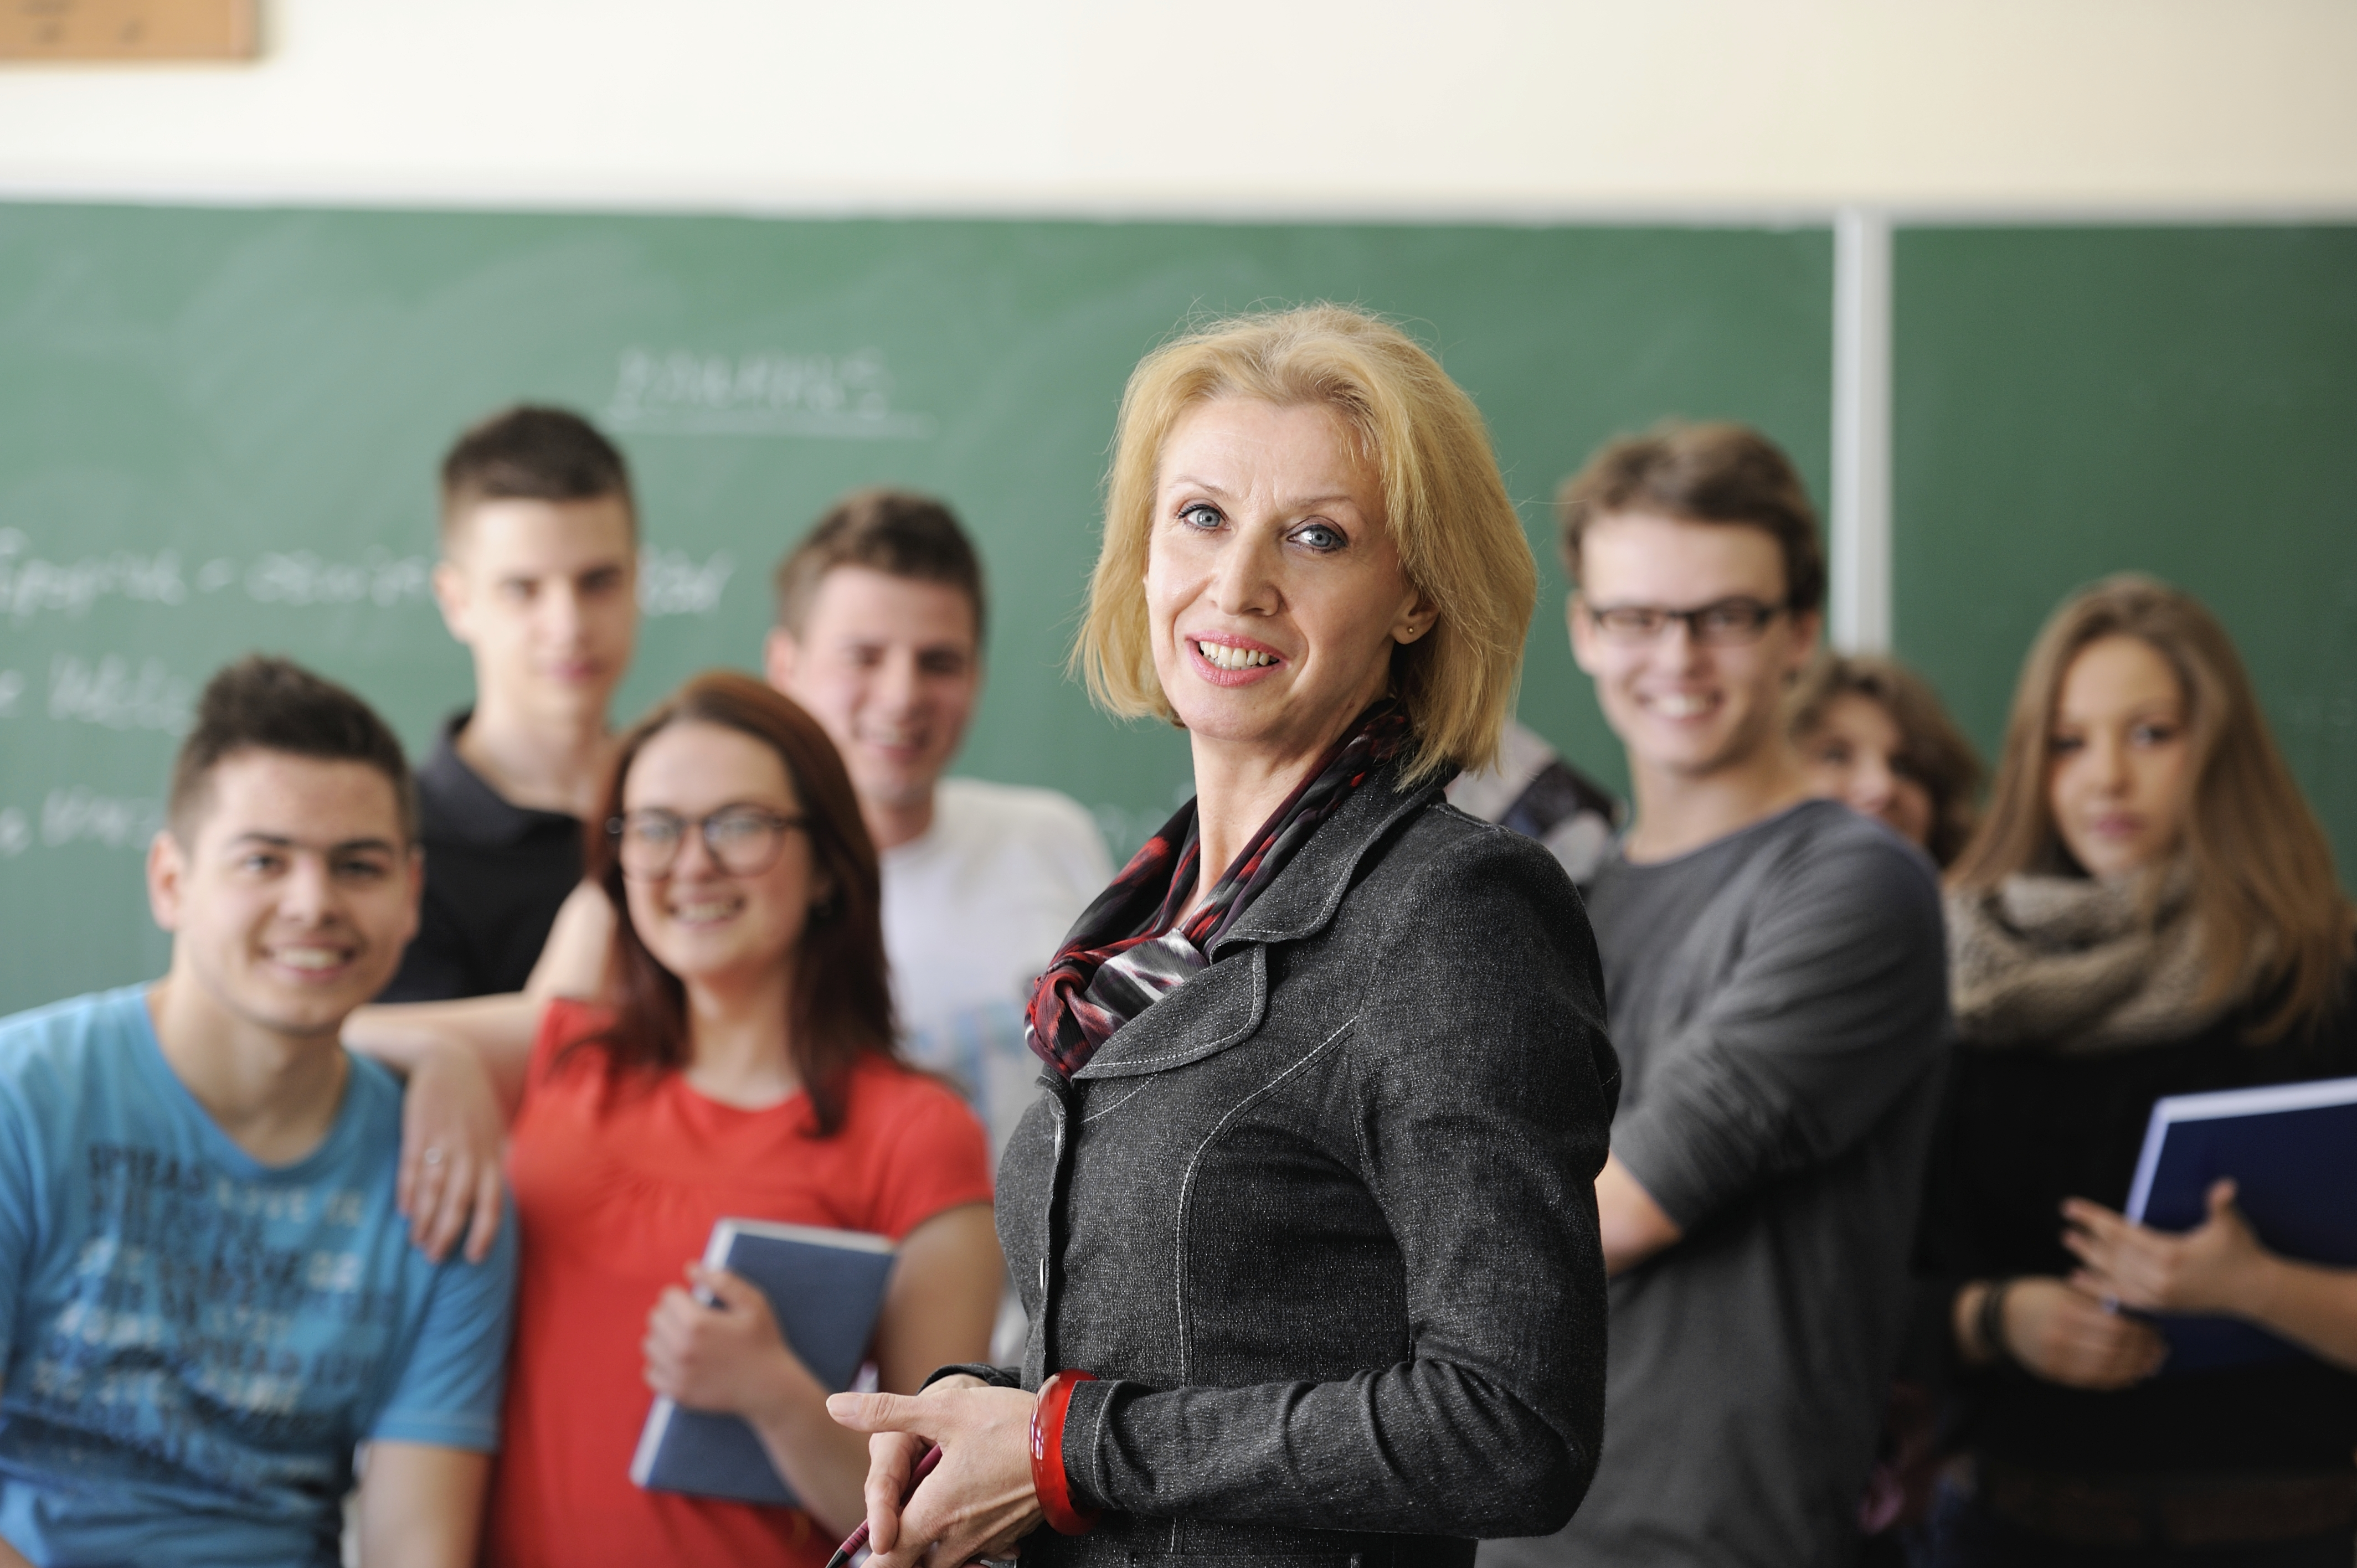 преподаватель по фотографии вакансии